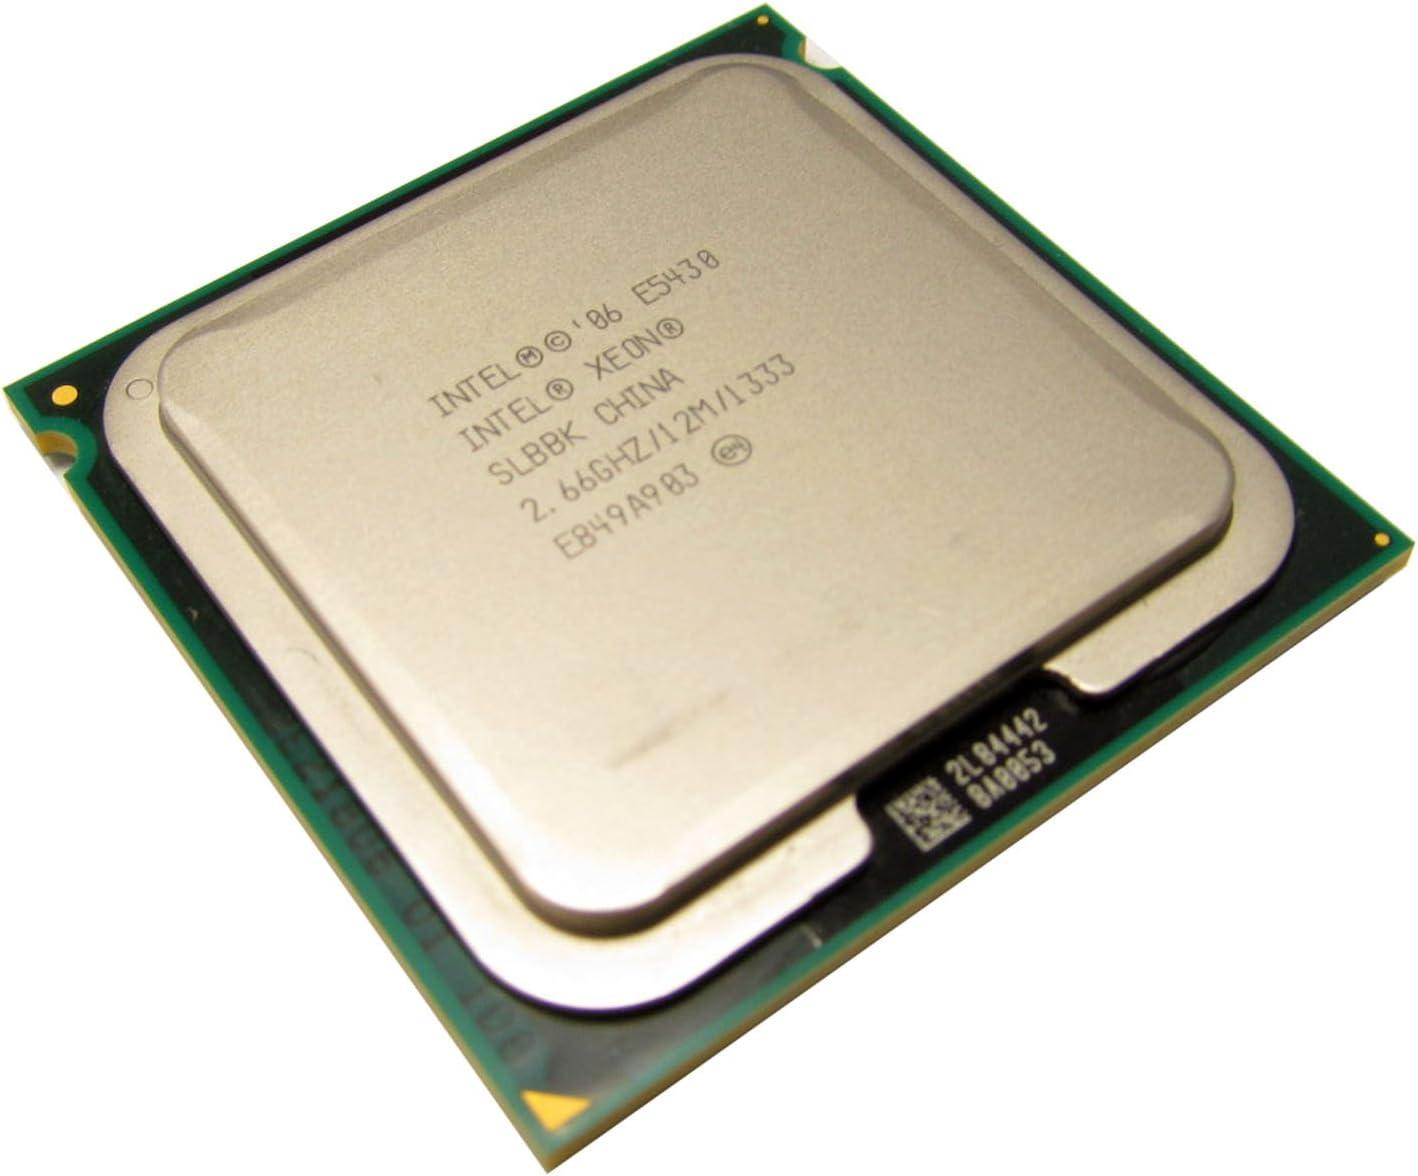 3GHz Intel Xeon E5450 QUAD-CORE 1333MHz 12MB L2 Cache Socket LGA771 Slanq Renewed